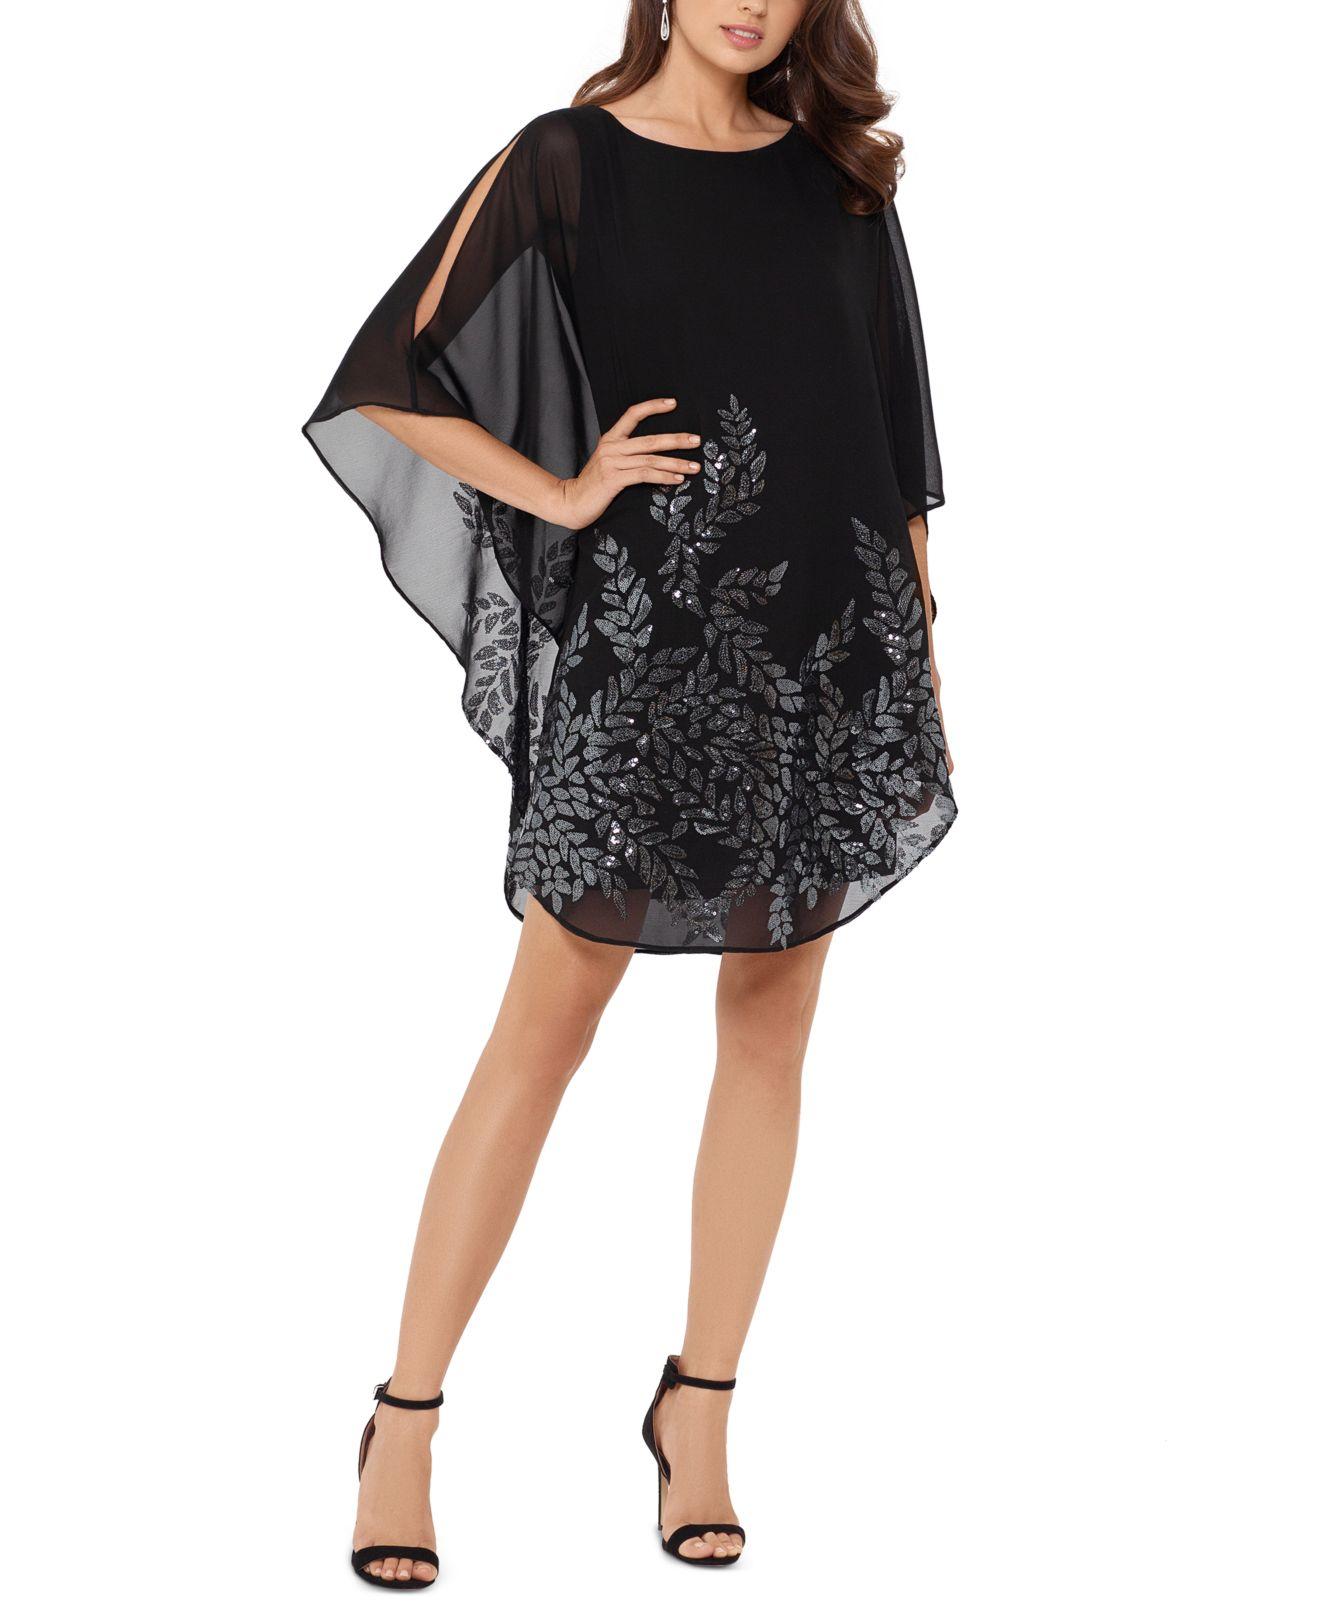 Xscape Women's Dress Black Size 6 Shift Overlay Sequin Split Sleeve